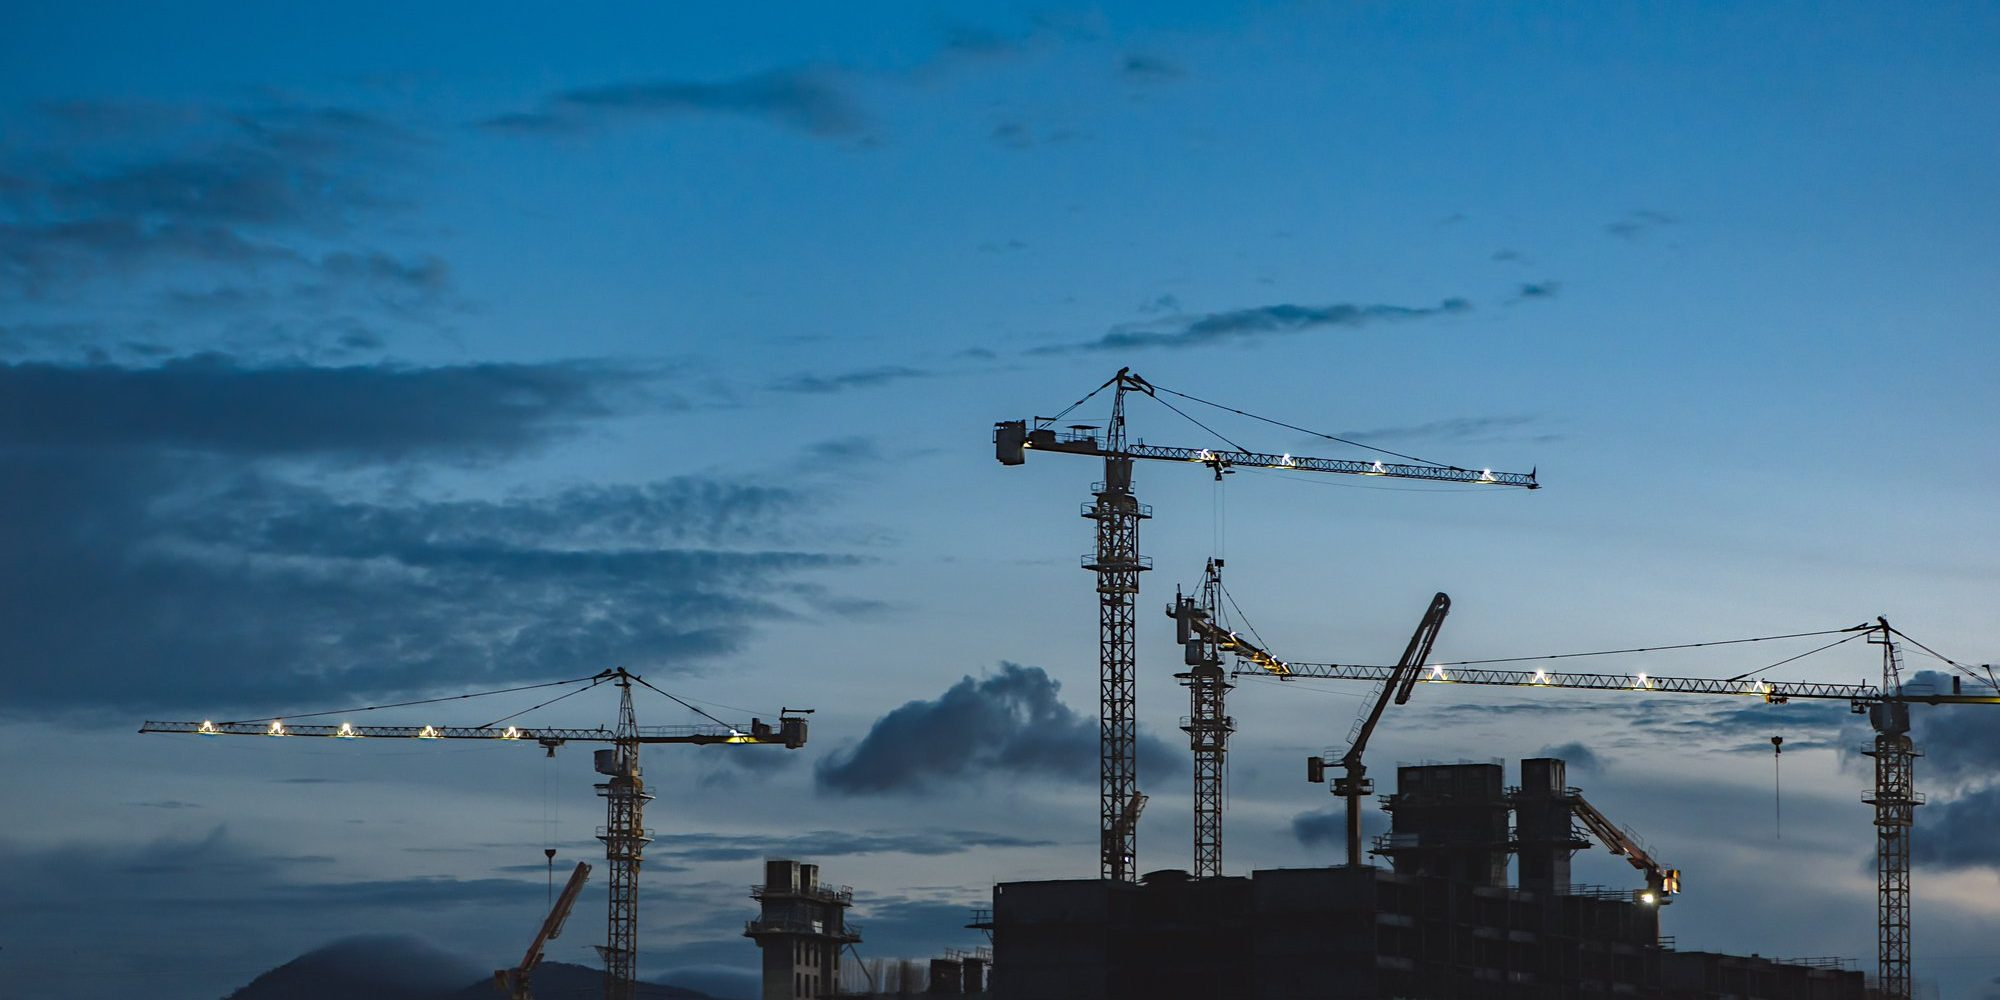 Dubai Off Plan Property Investment Remains Stable Despite Pandemic